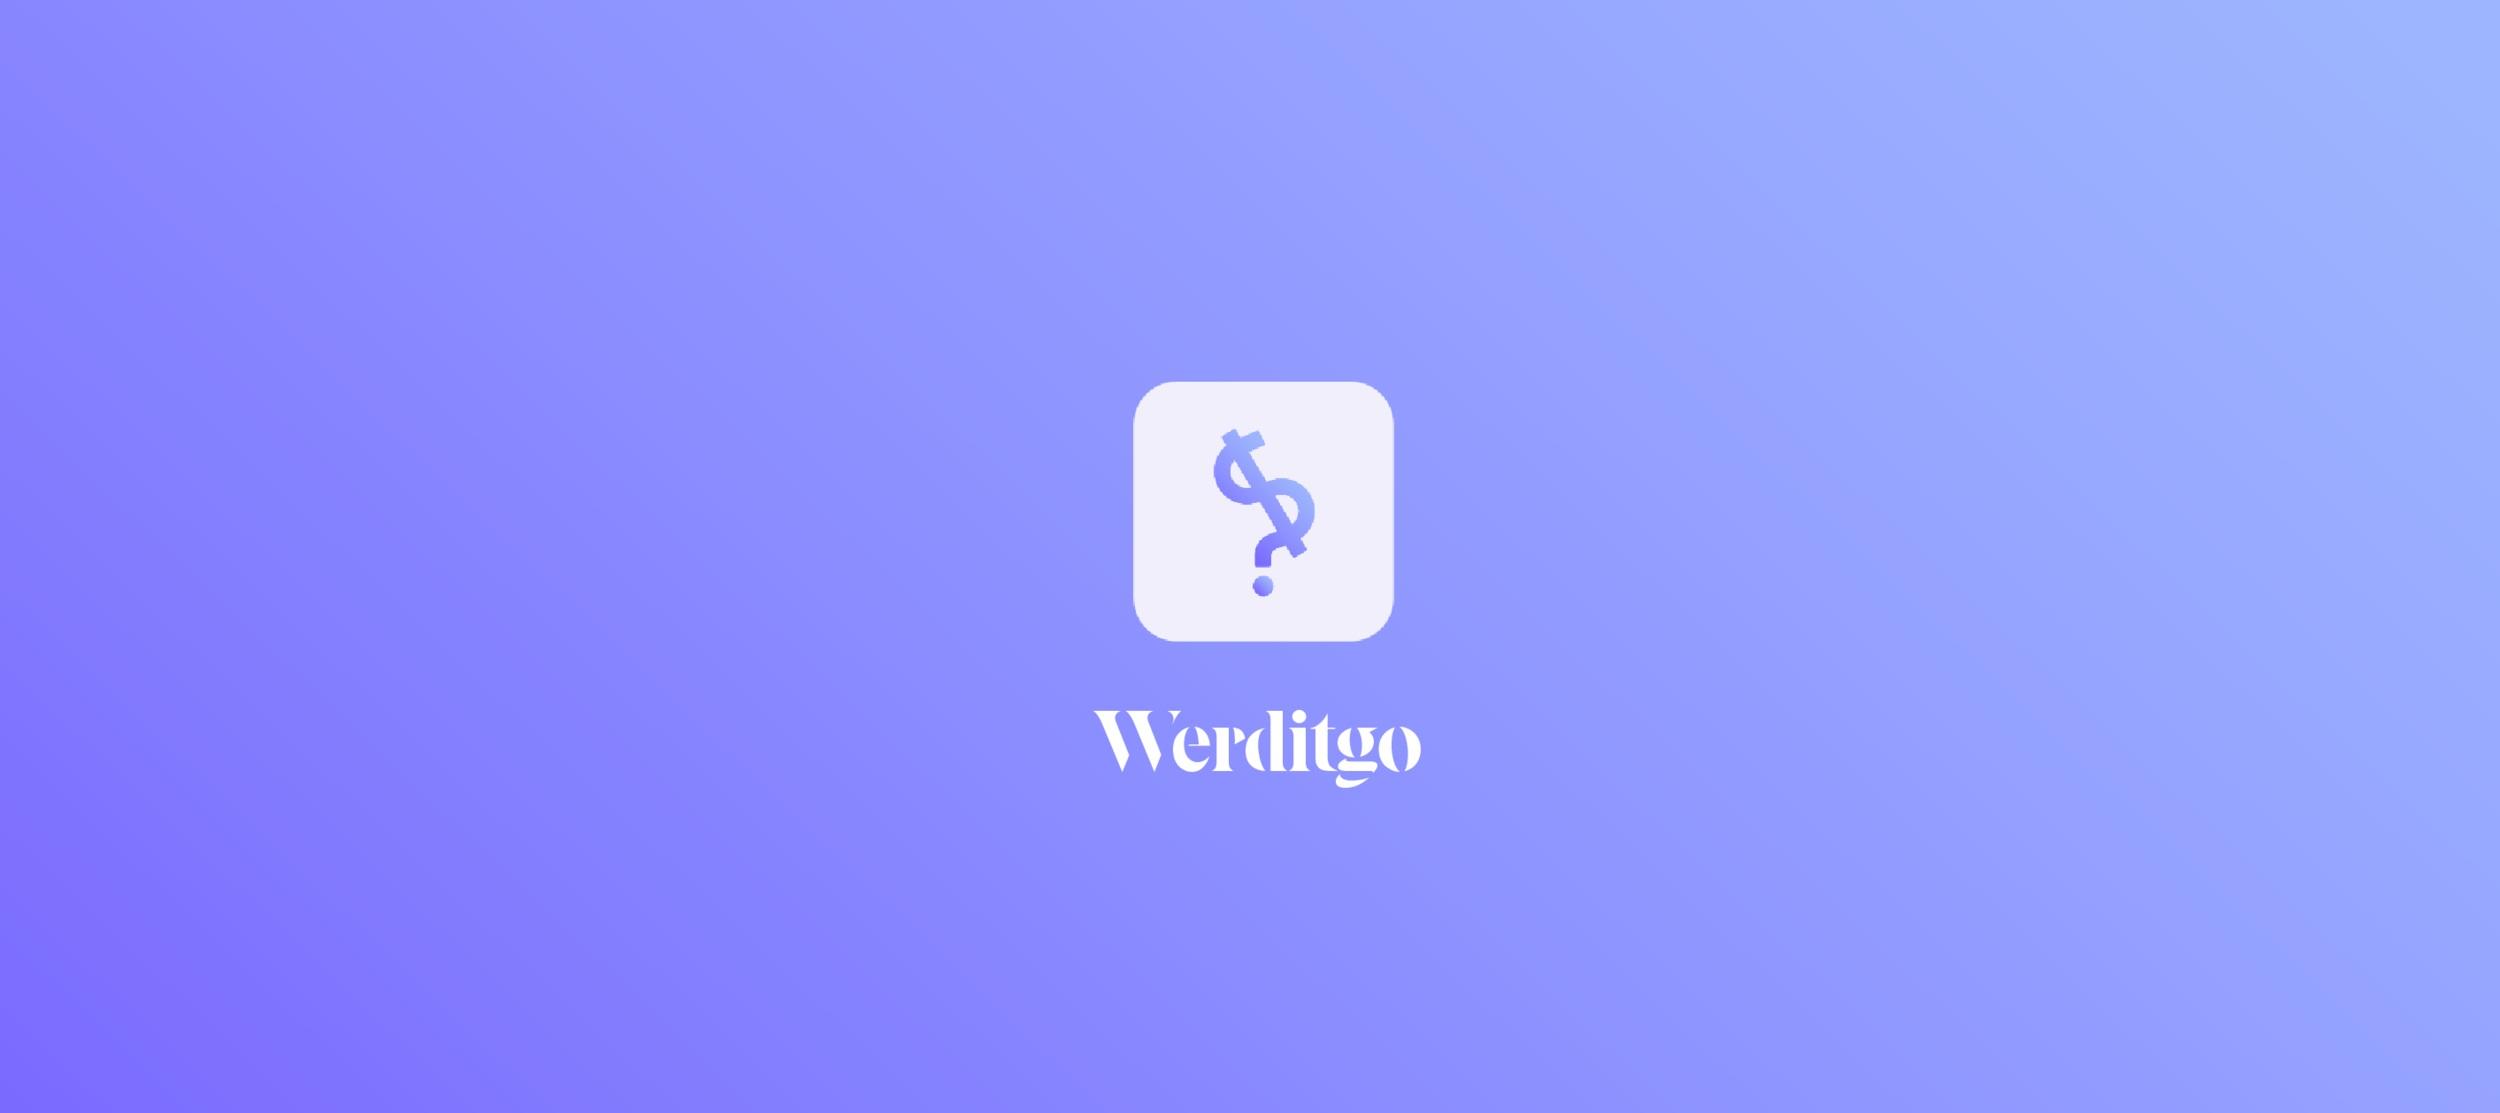 Werditgo.jpg